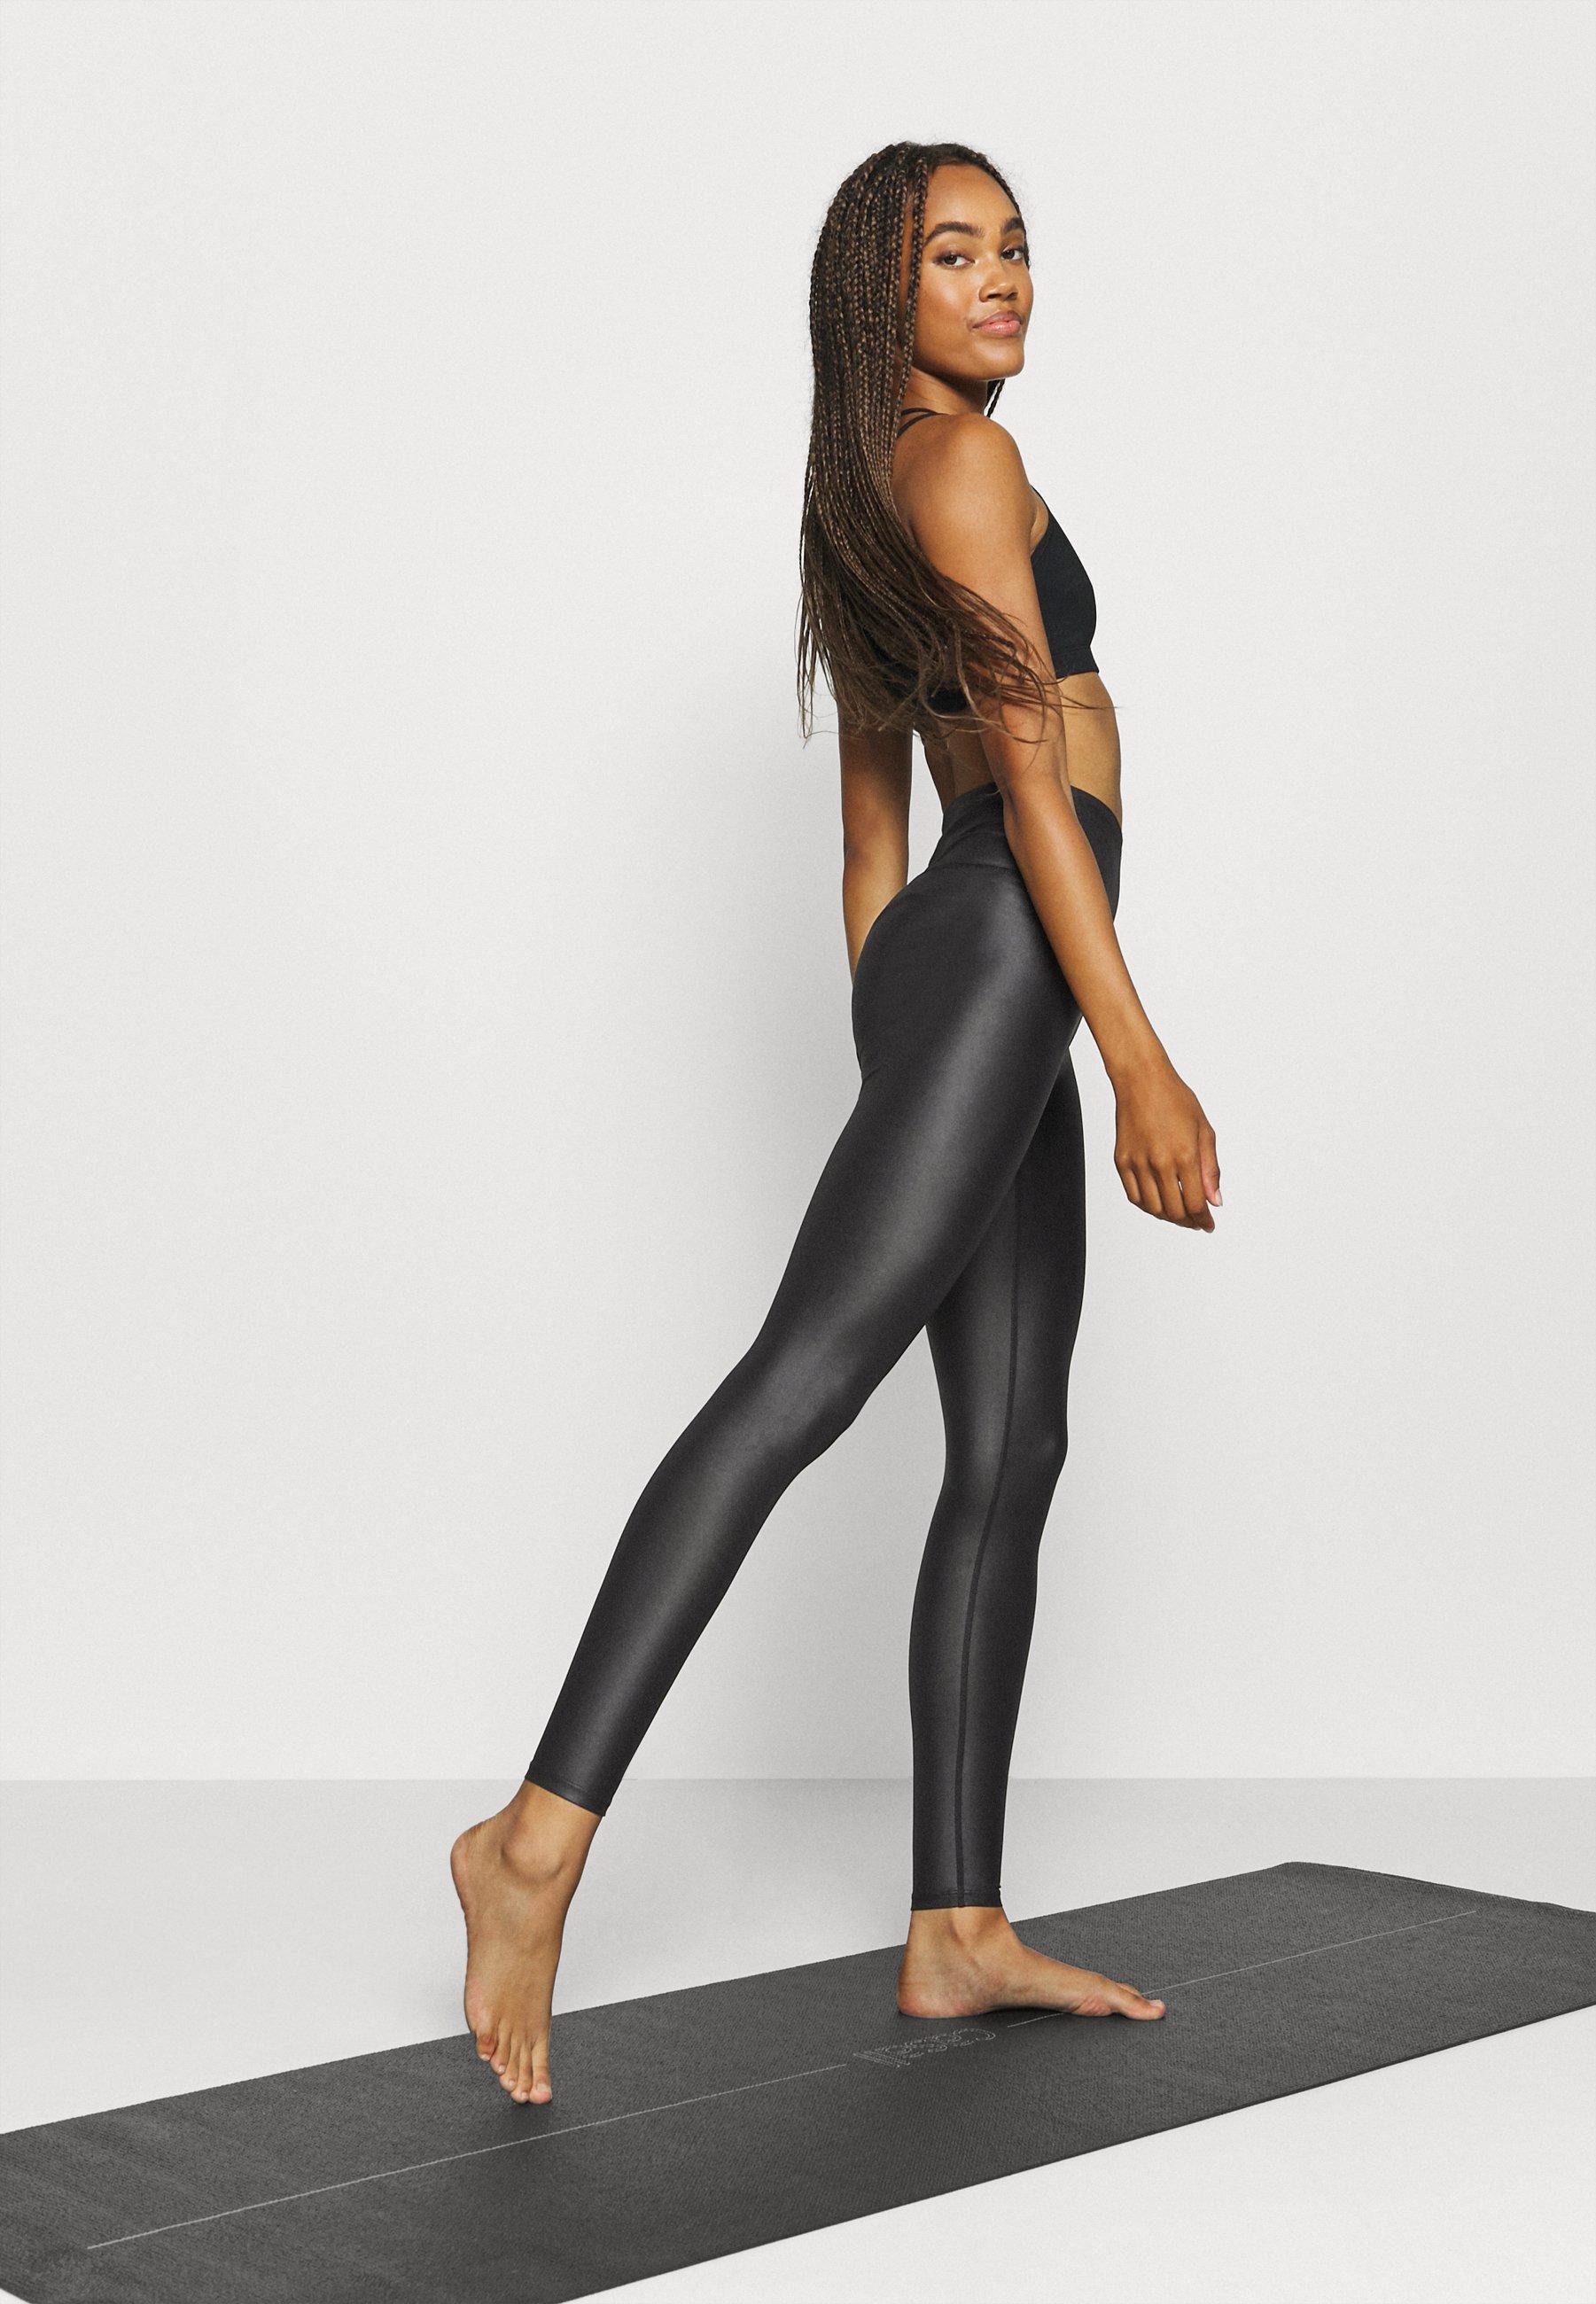 Donna WETLOOK HIGHWAIST LEGGING - Collant